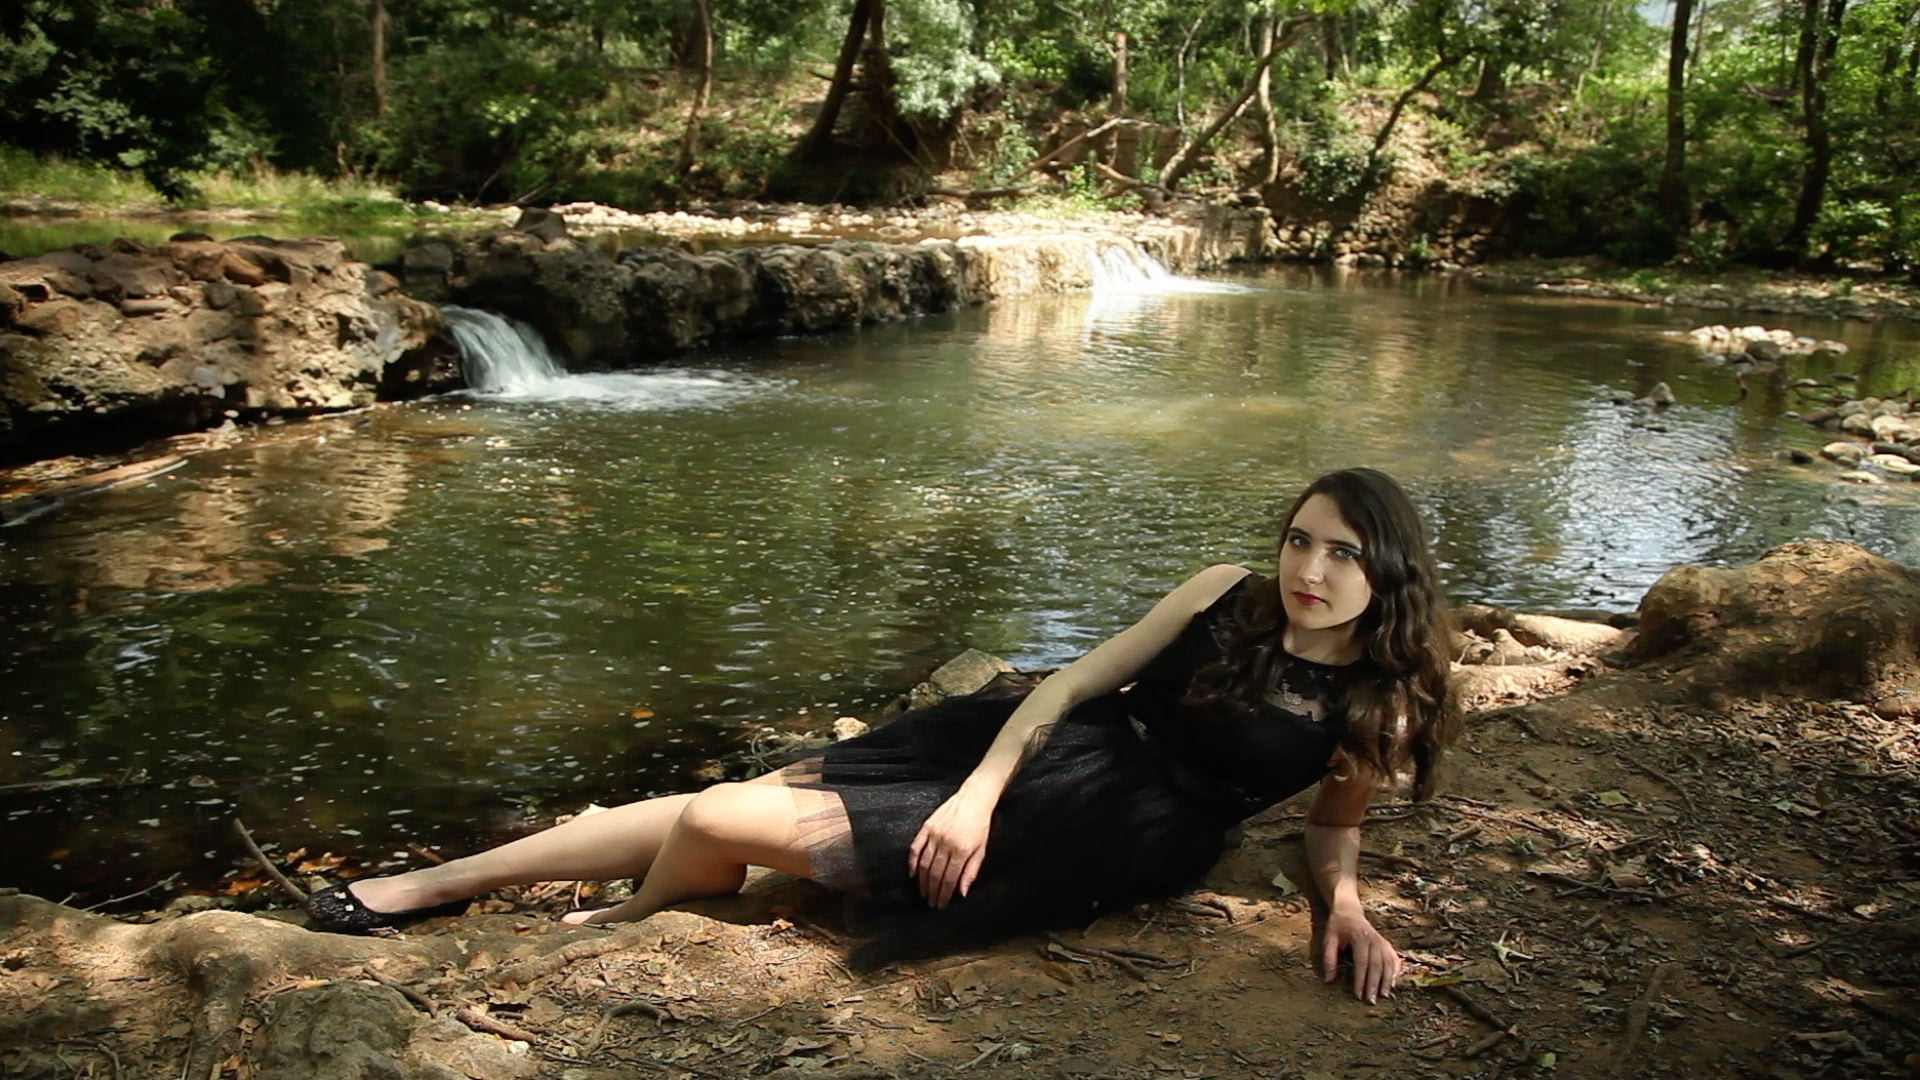 clip – Juste en rêvant – Manon Novak -viviane -riberaigua -realisateur music video director. jpg